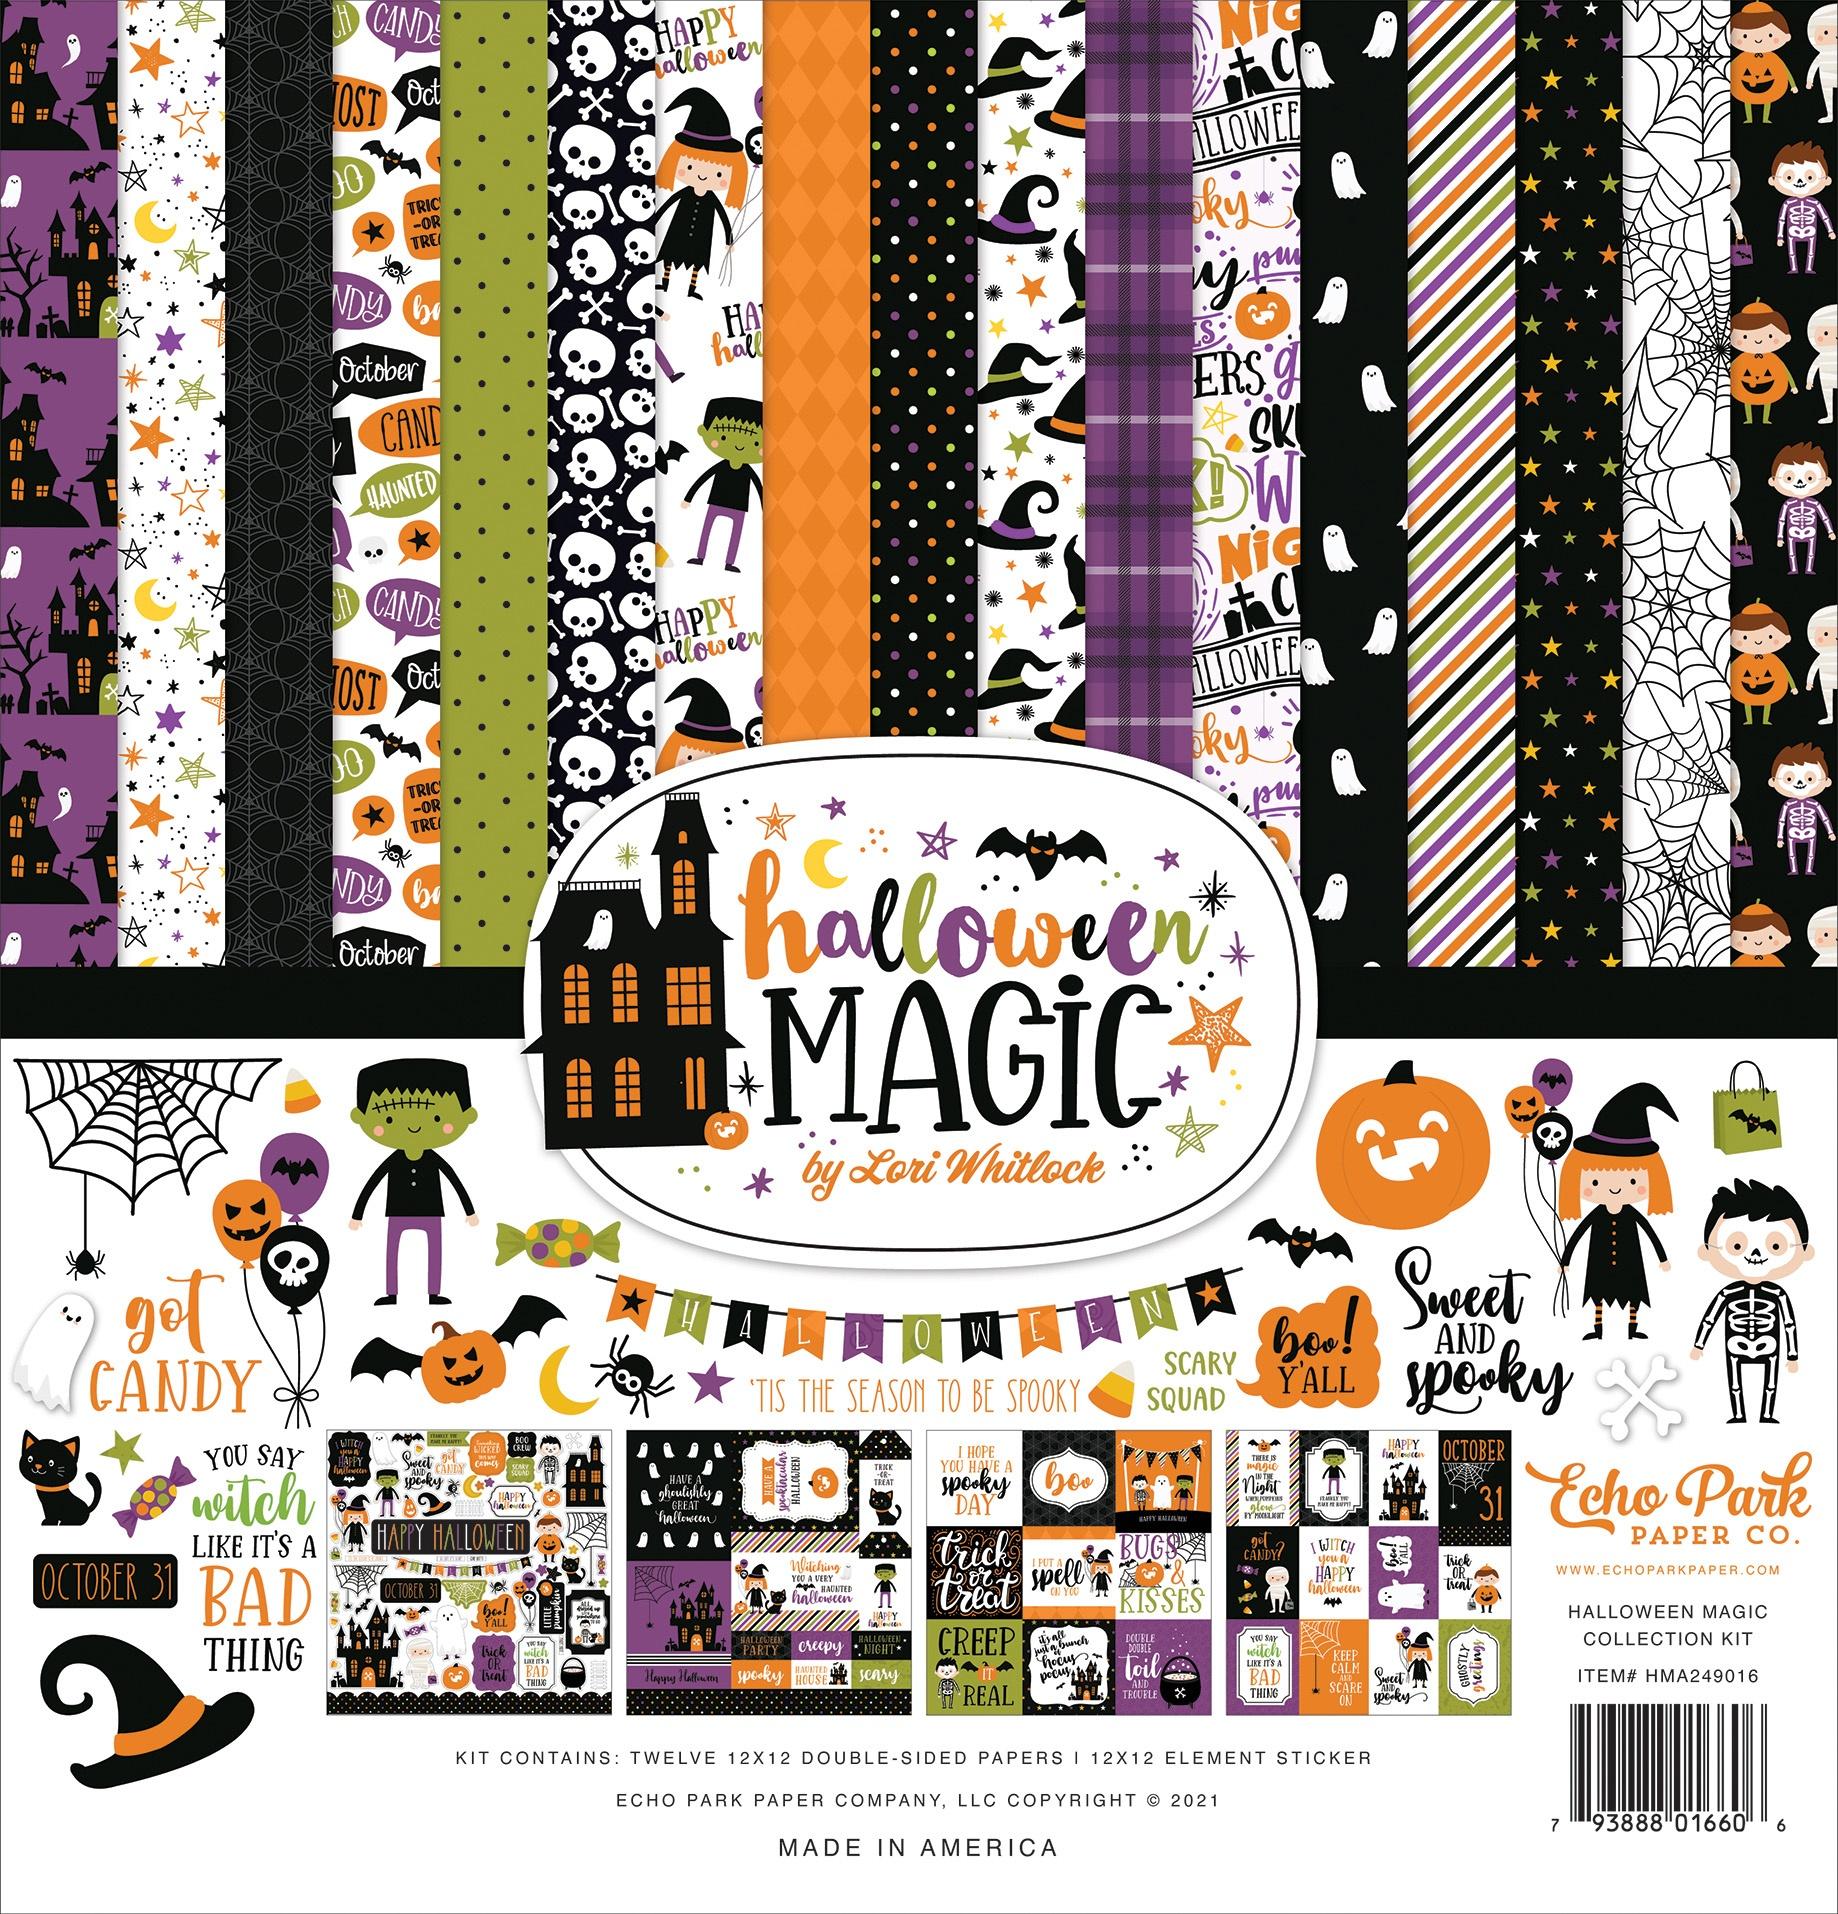 Echo Park Collection Kit 12X12-Halloween Magic